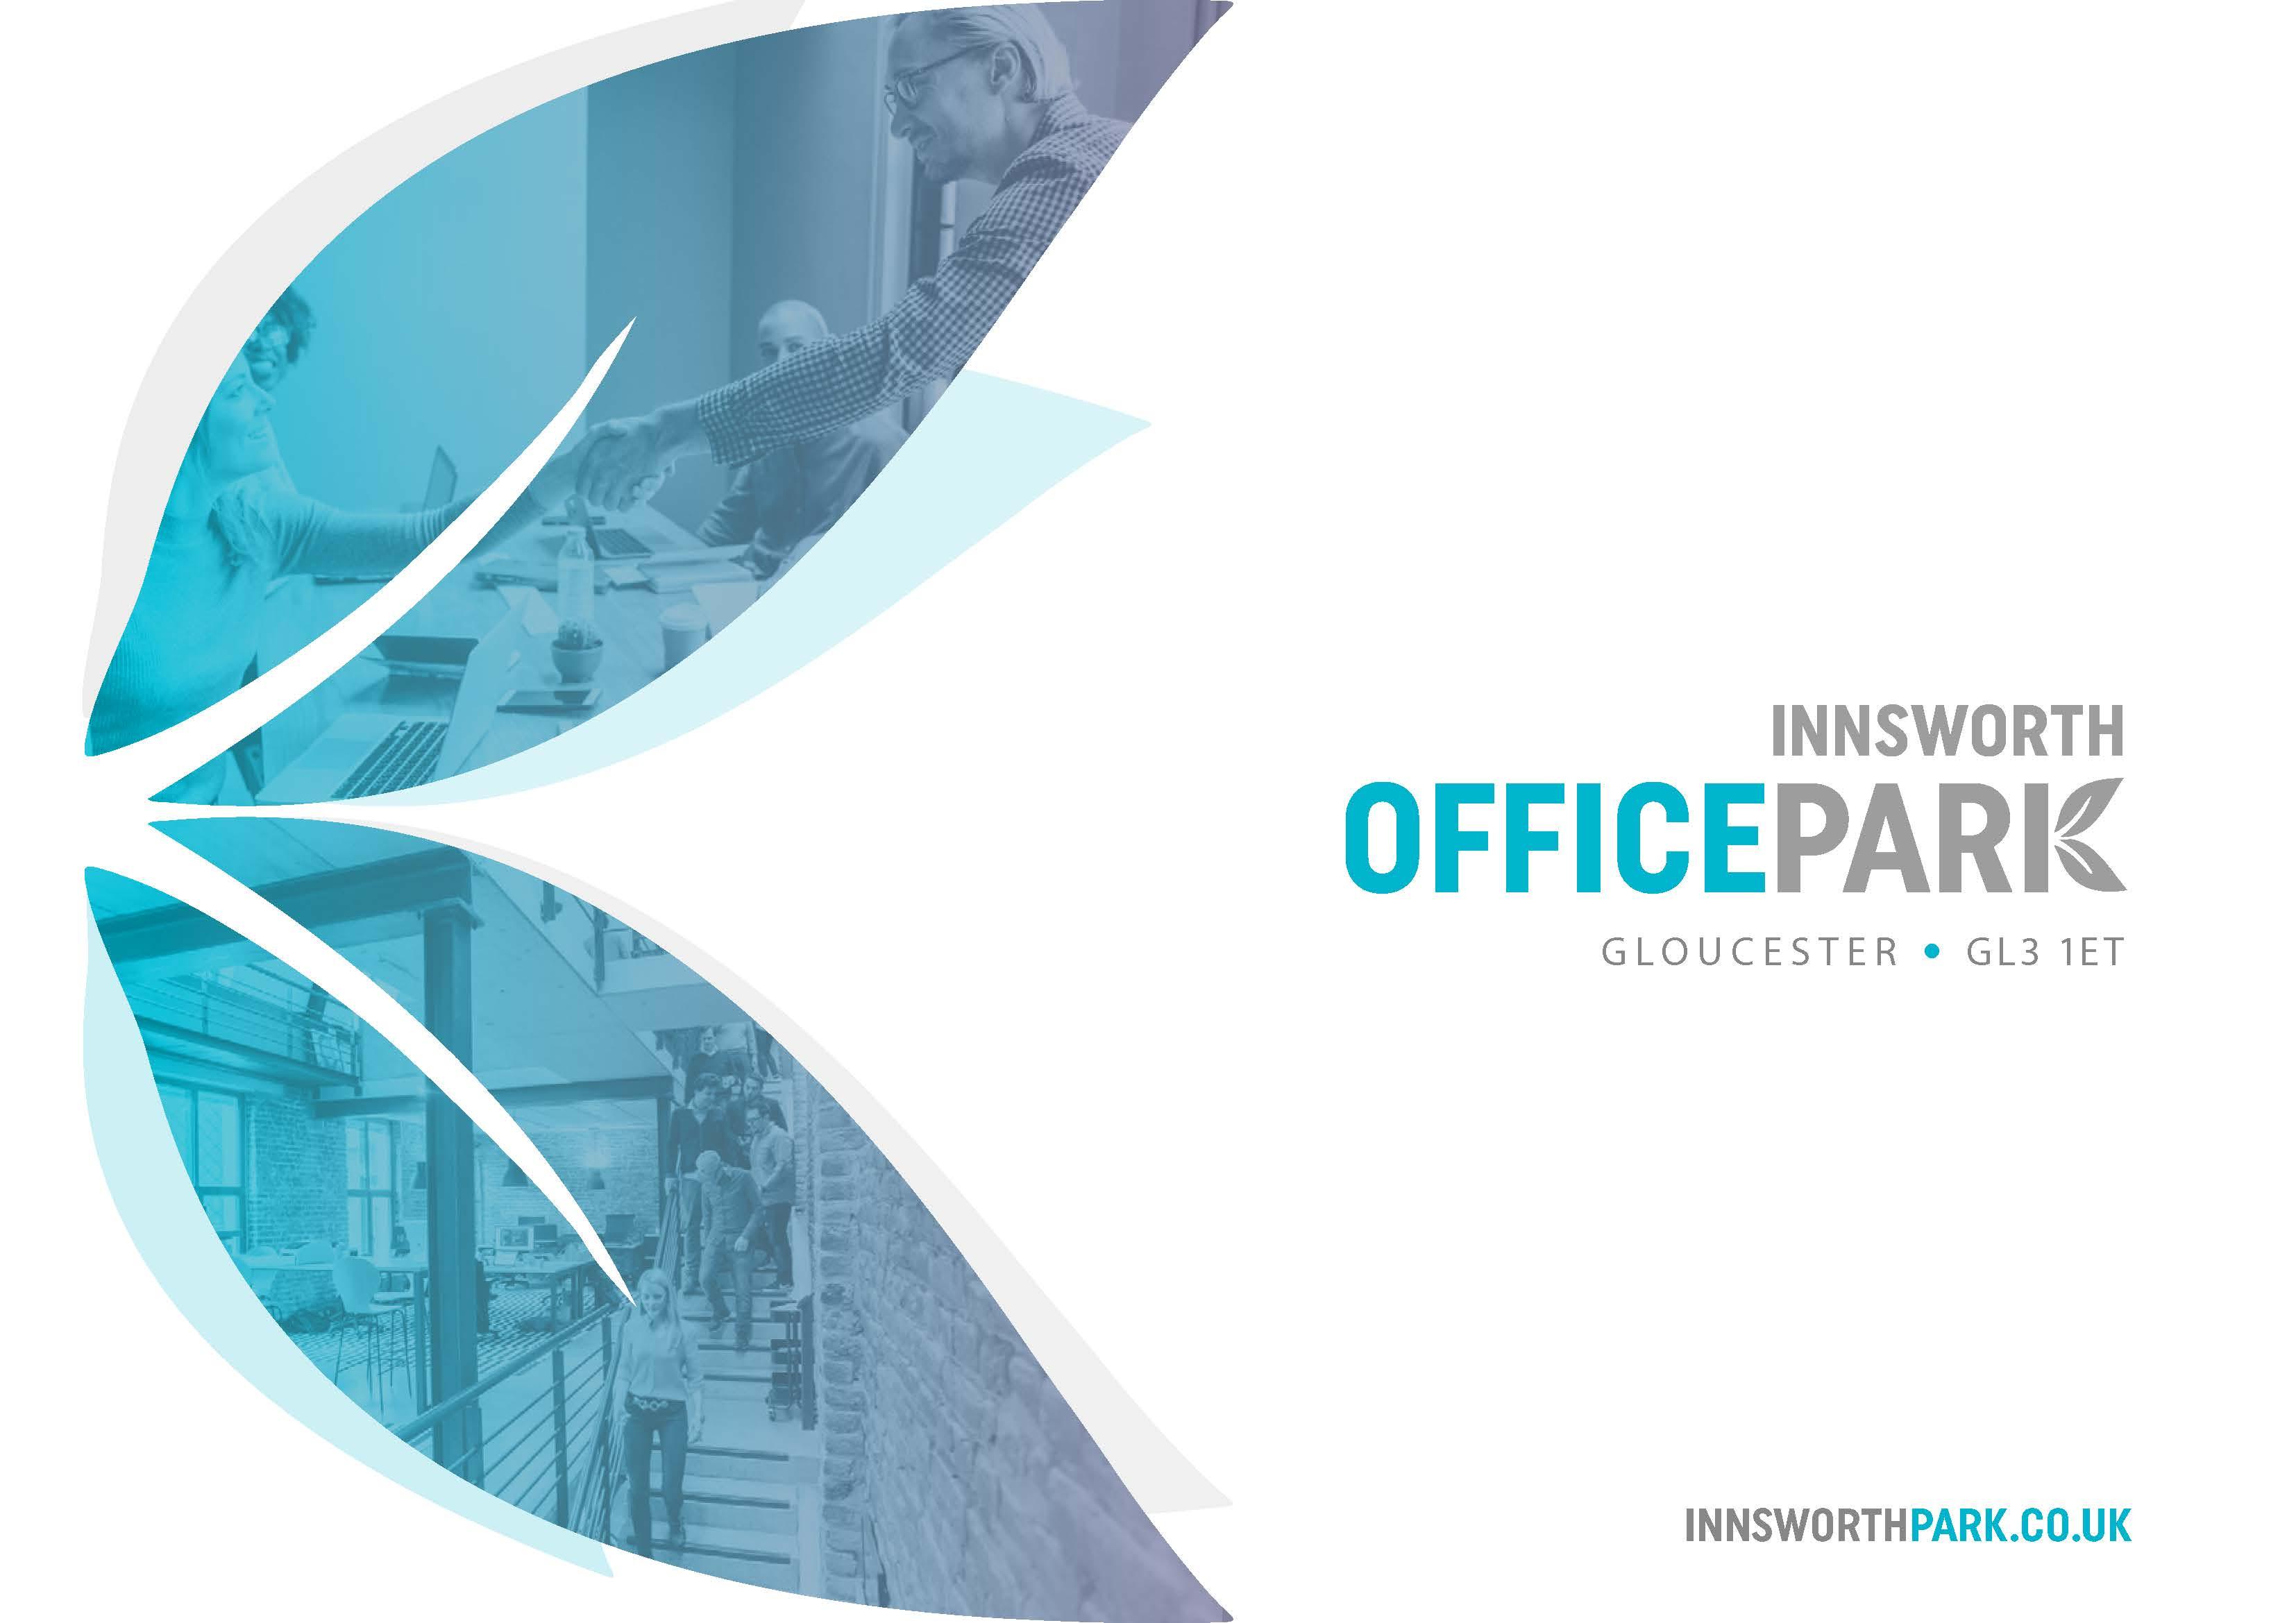 Innsworth Office Park, GLOUCESTER